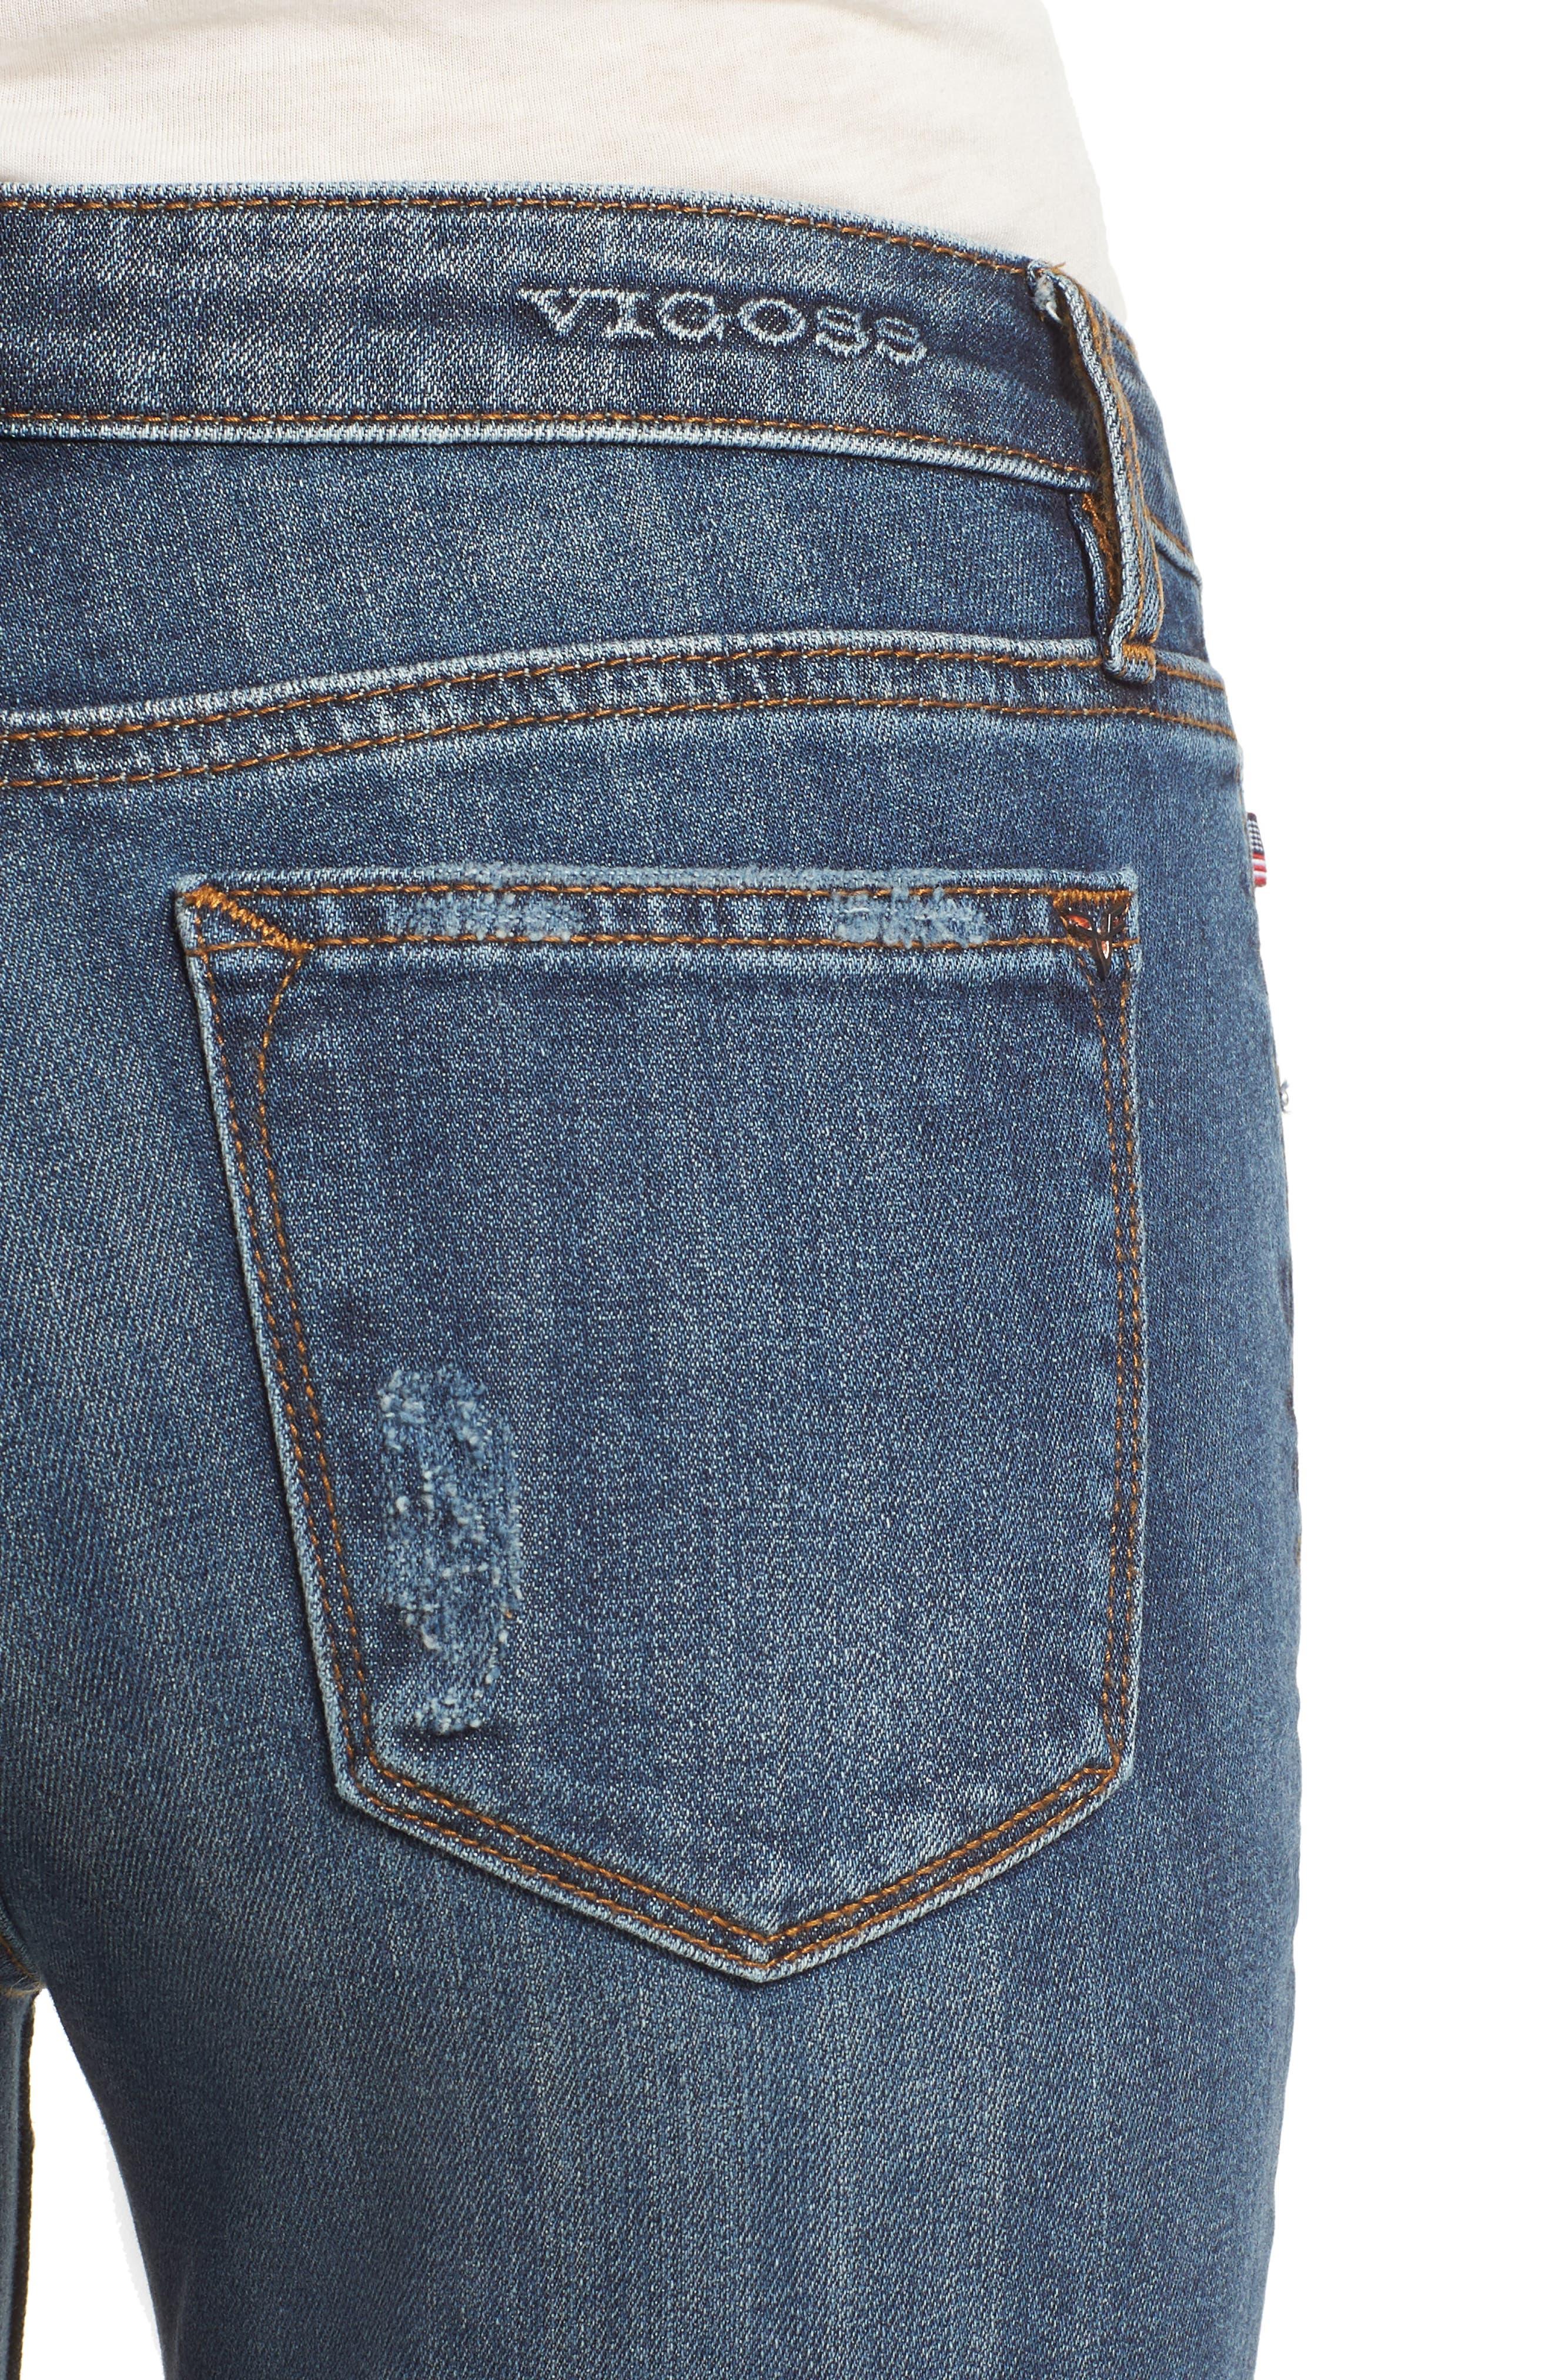 Jagger Skinny Jeans,                             Alternate thumbnail 4, color,                             Medium Wash